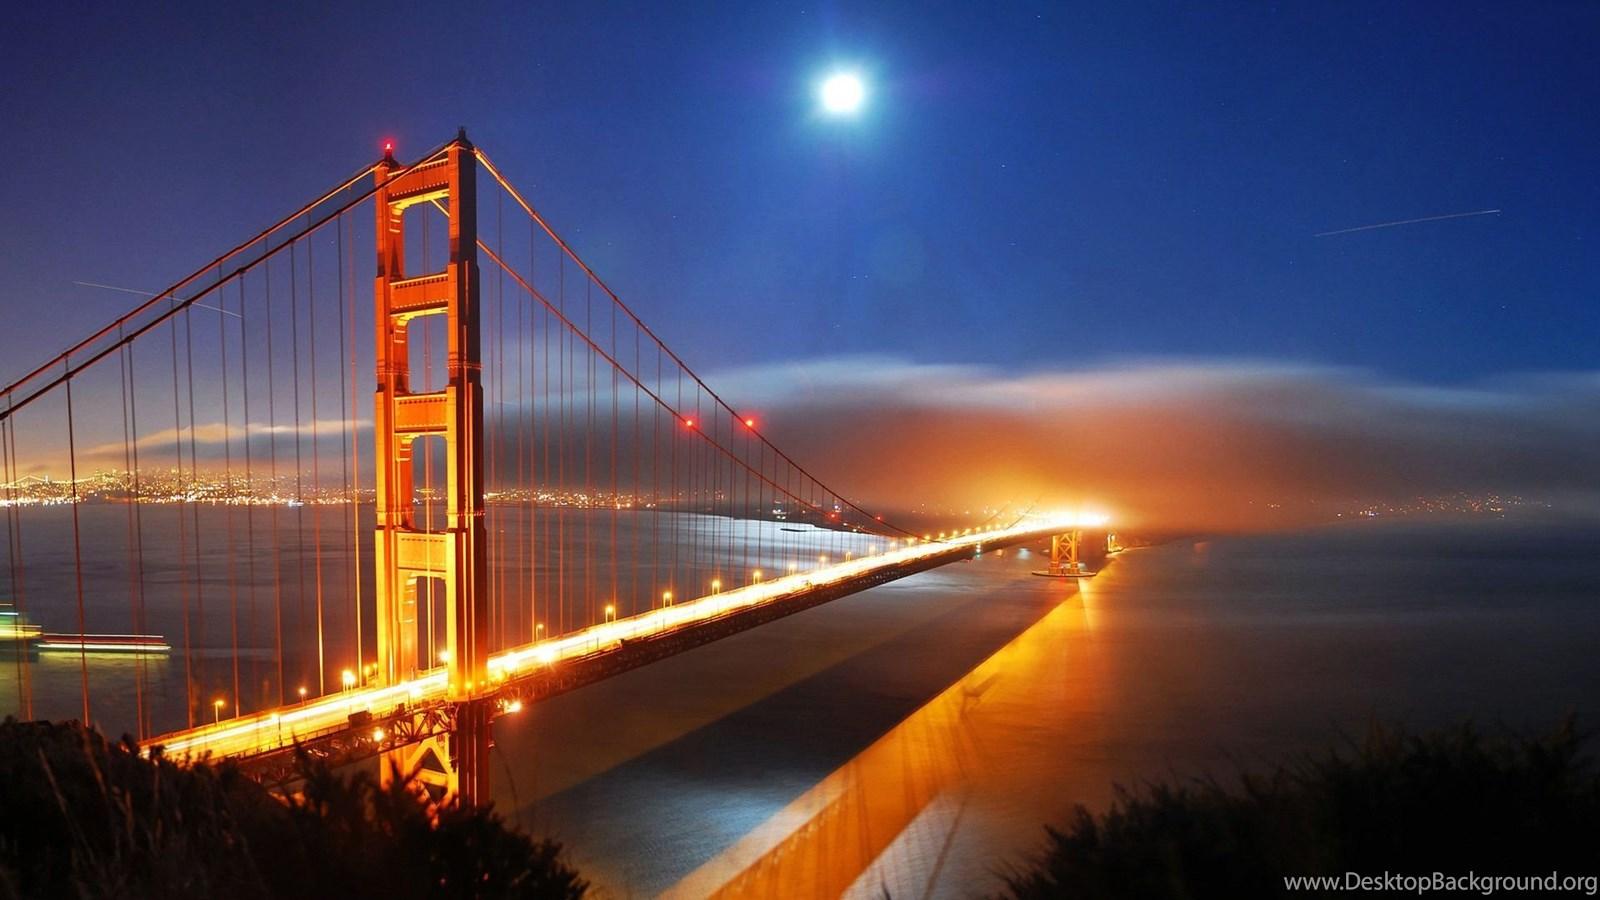 Download Bridge Hd Wallpapers 1080p Hd 1080p Wallpaper Backgrounds